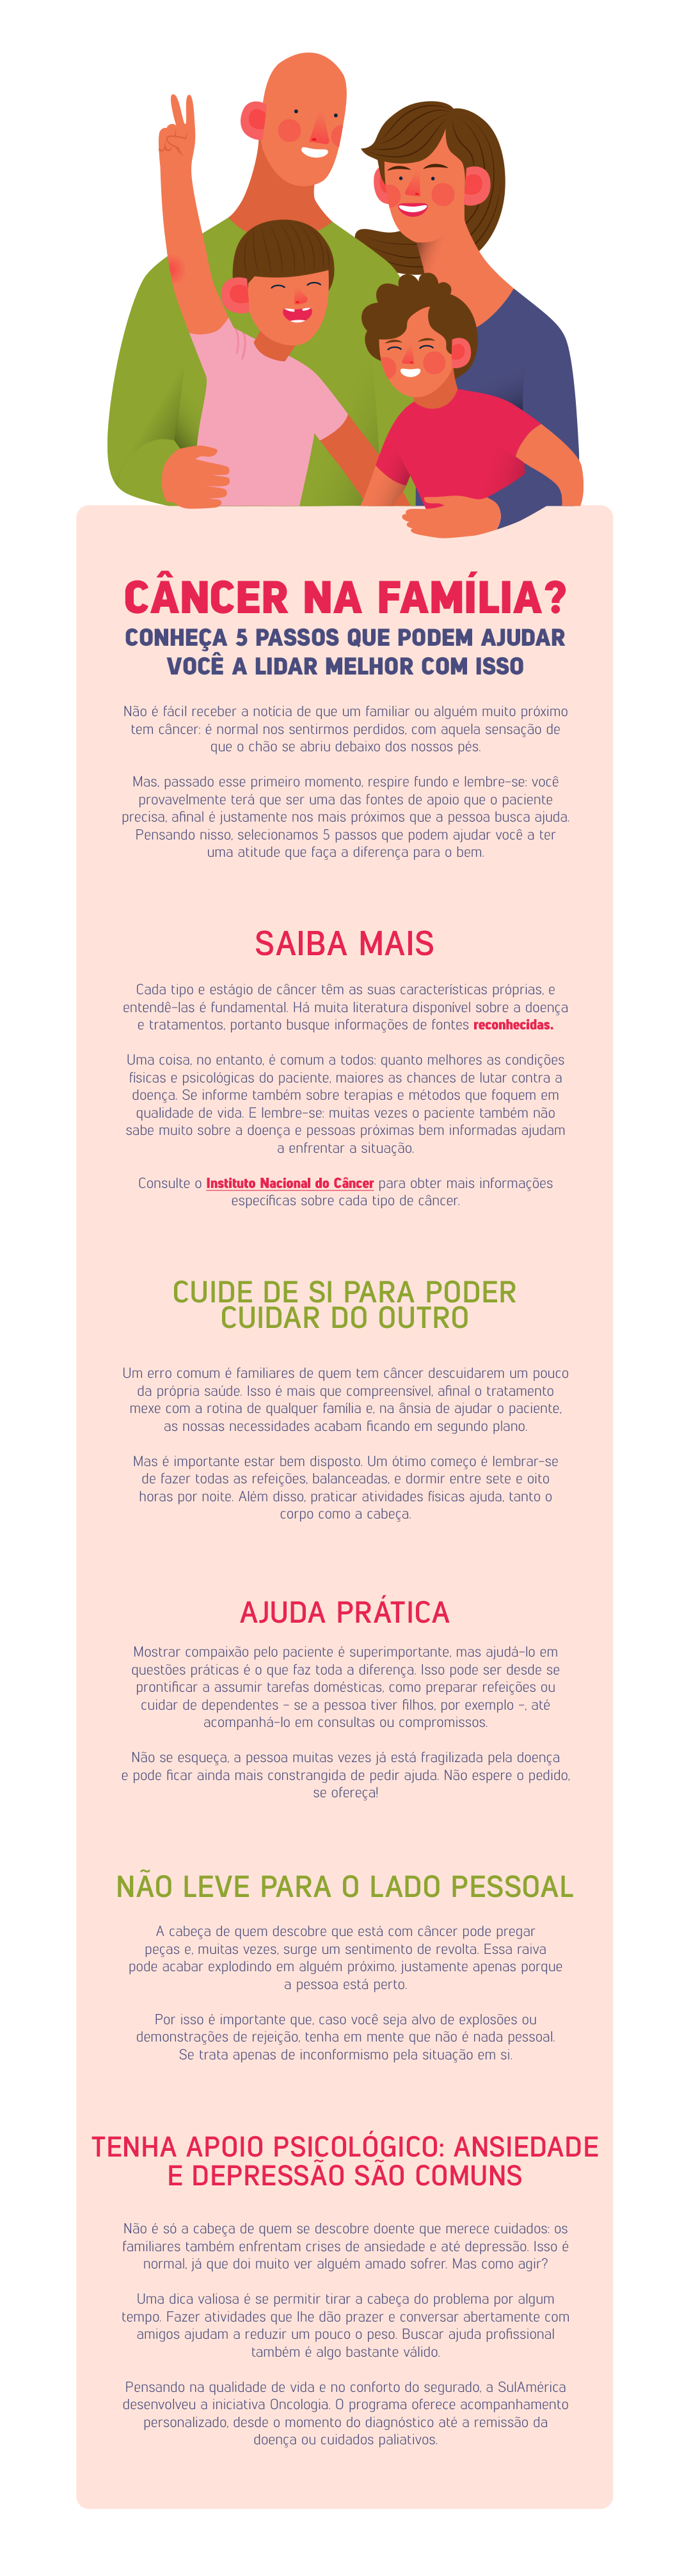 sulamerica-cancer-familia